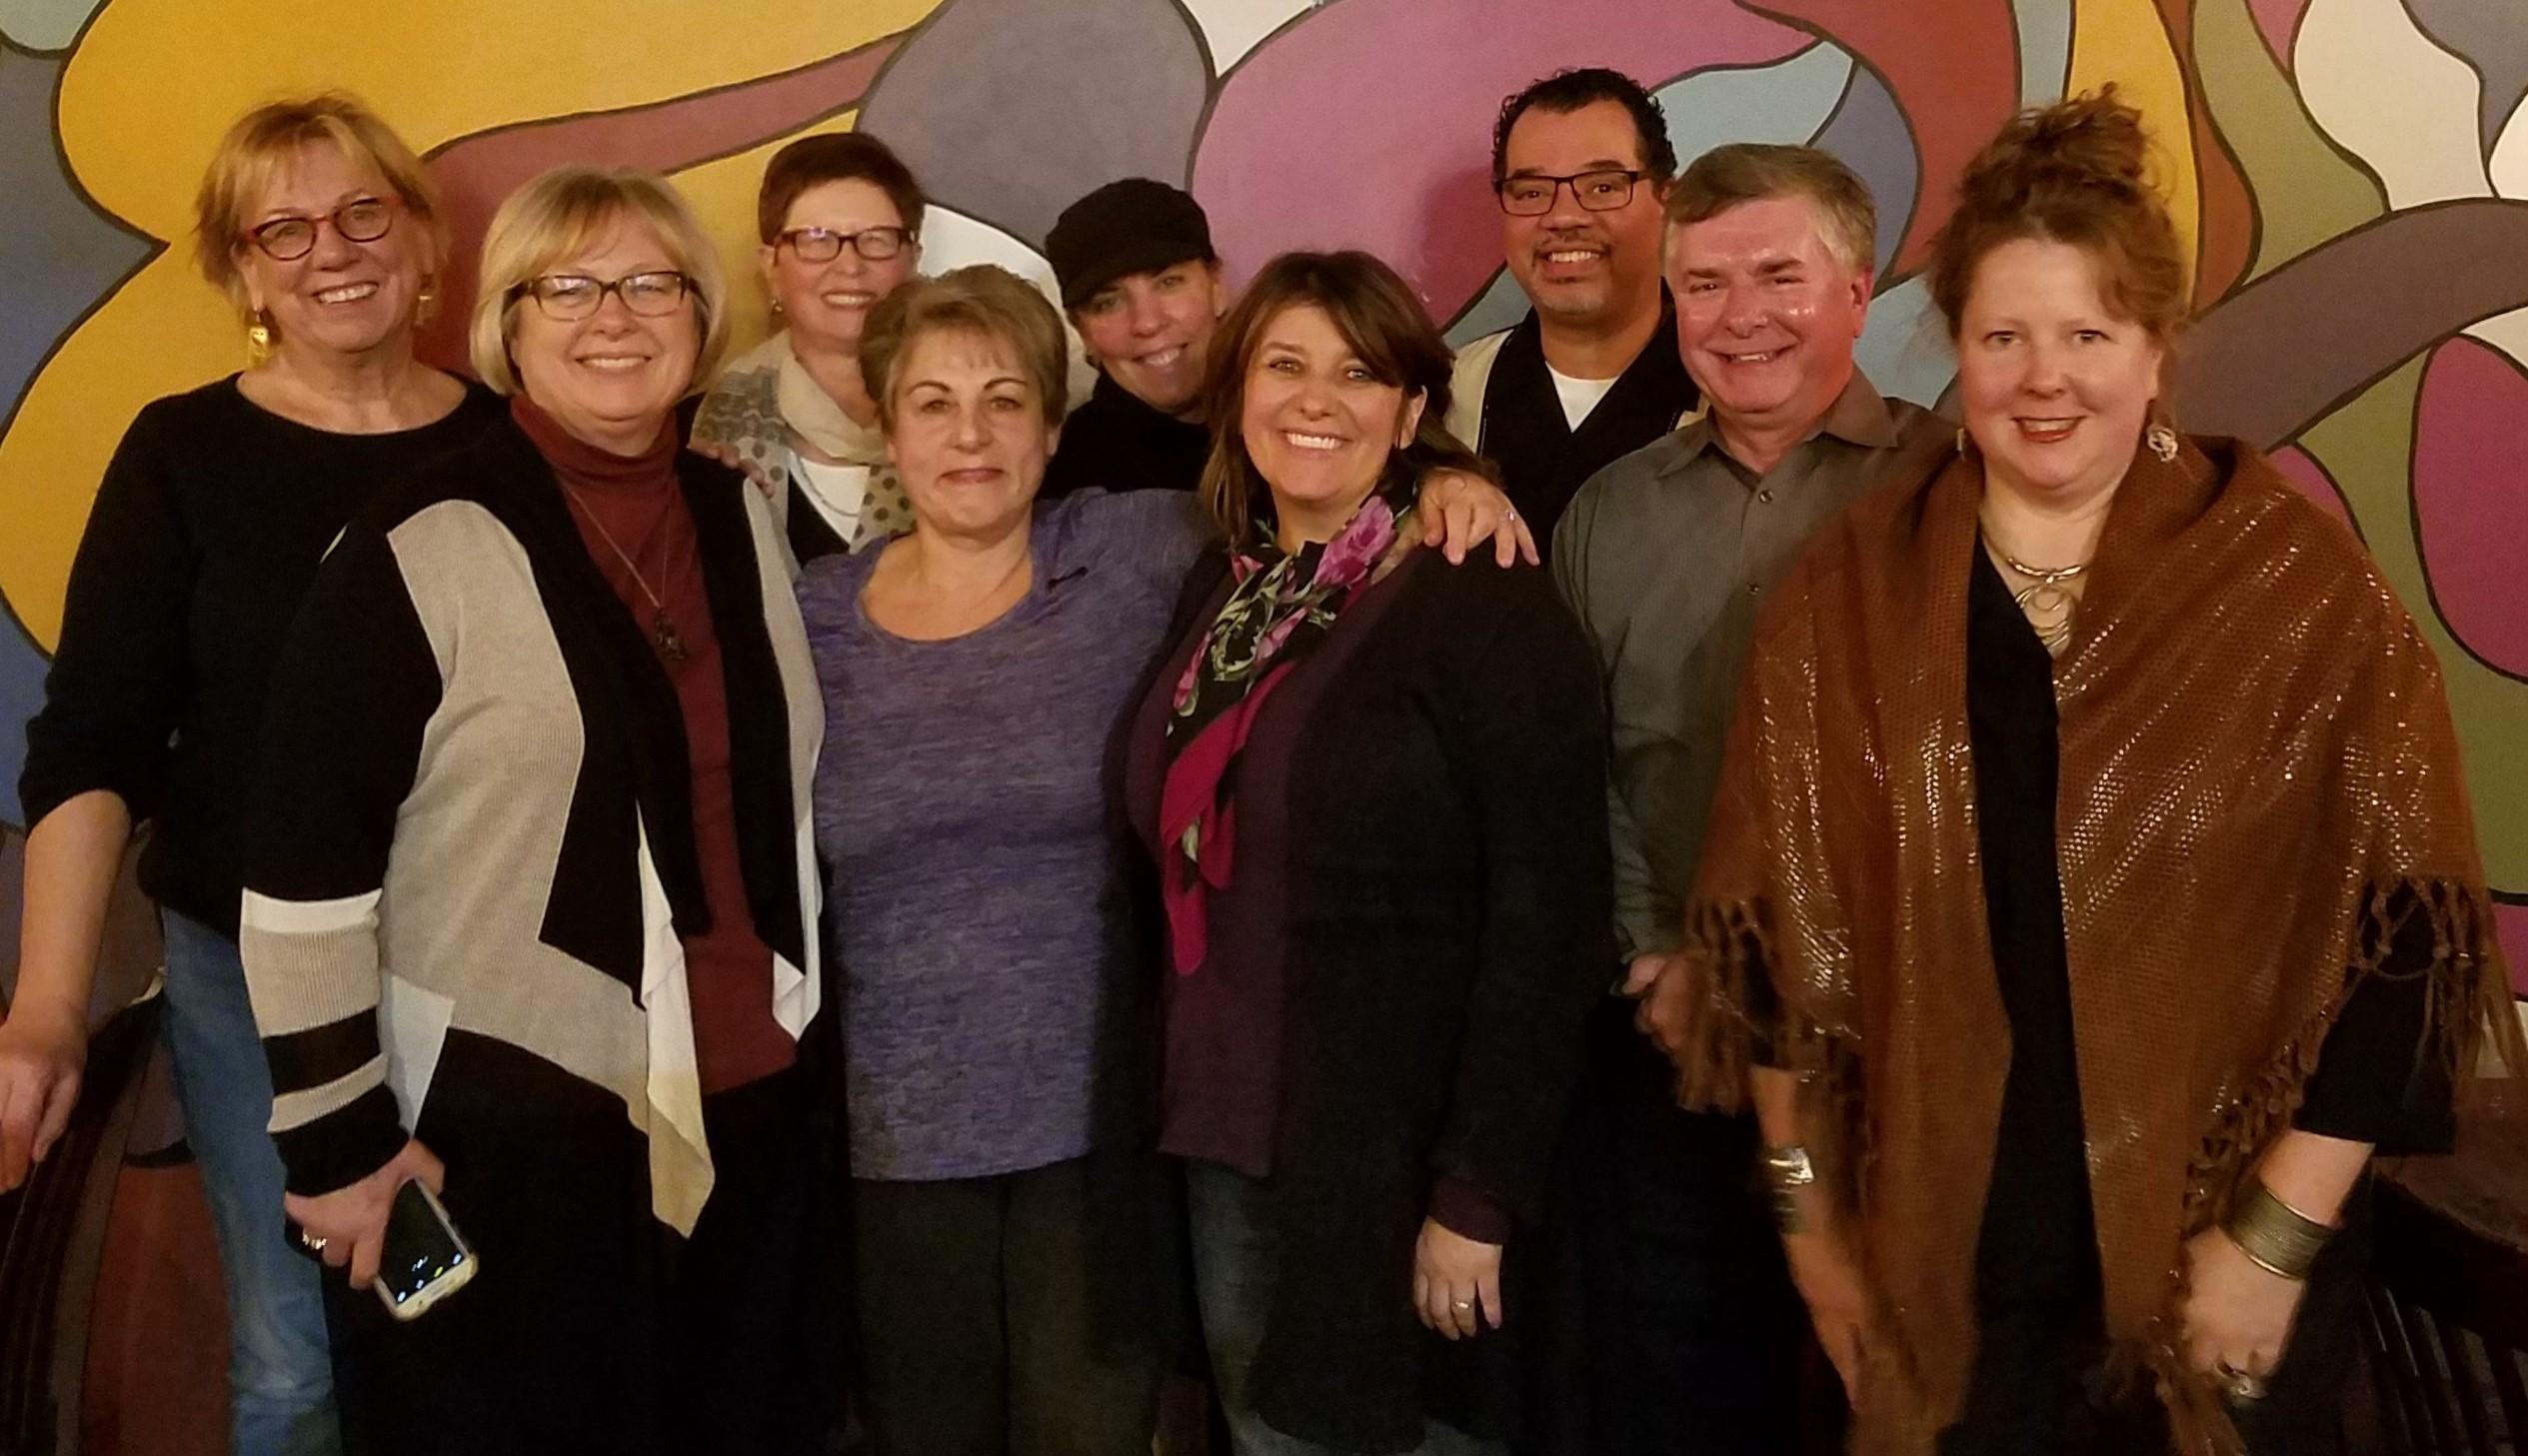 Happy Rosemary for Senate Campaign volunteers